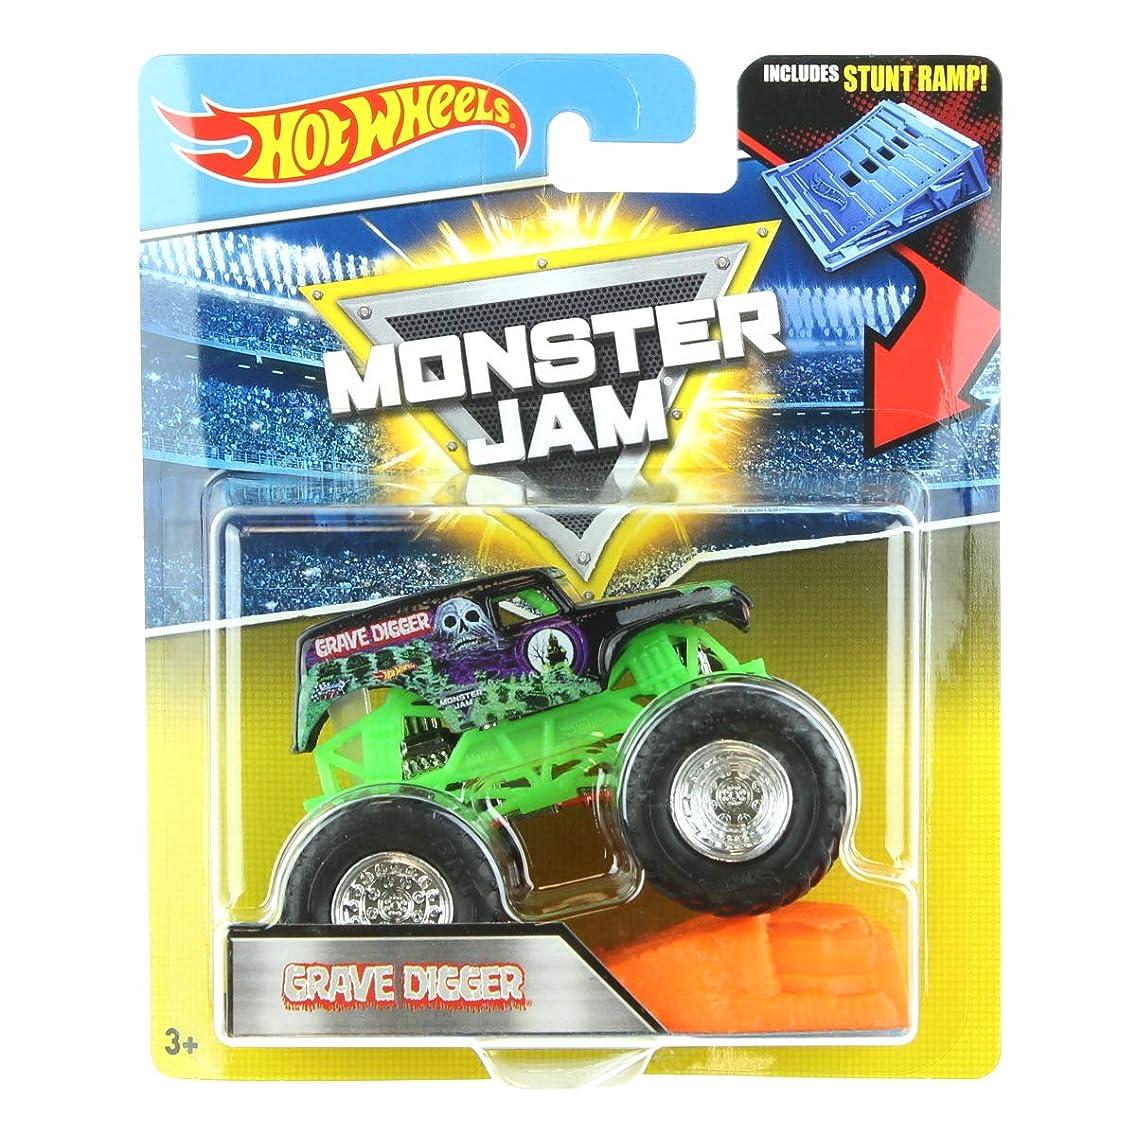 Hot Wheels Monster Jam 1:64 Grave Digger includes Stunt Ramp 2017